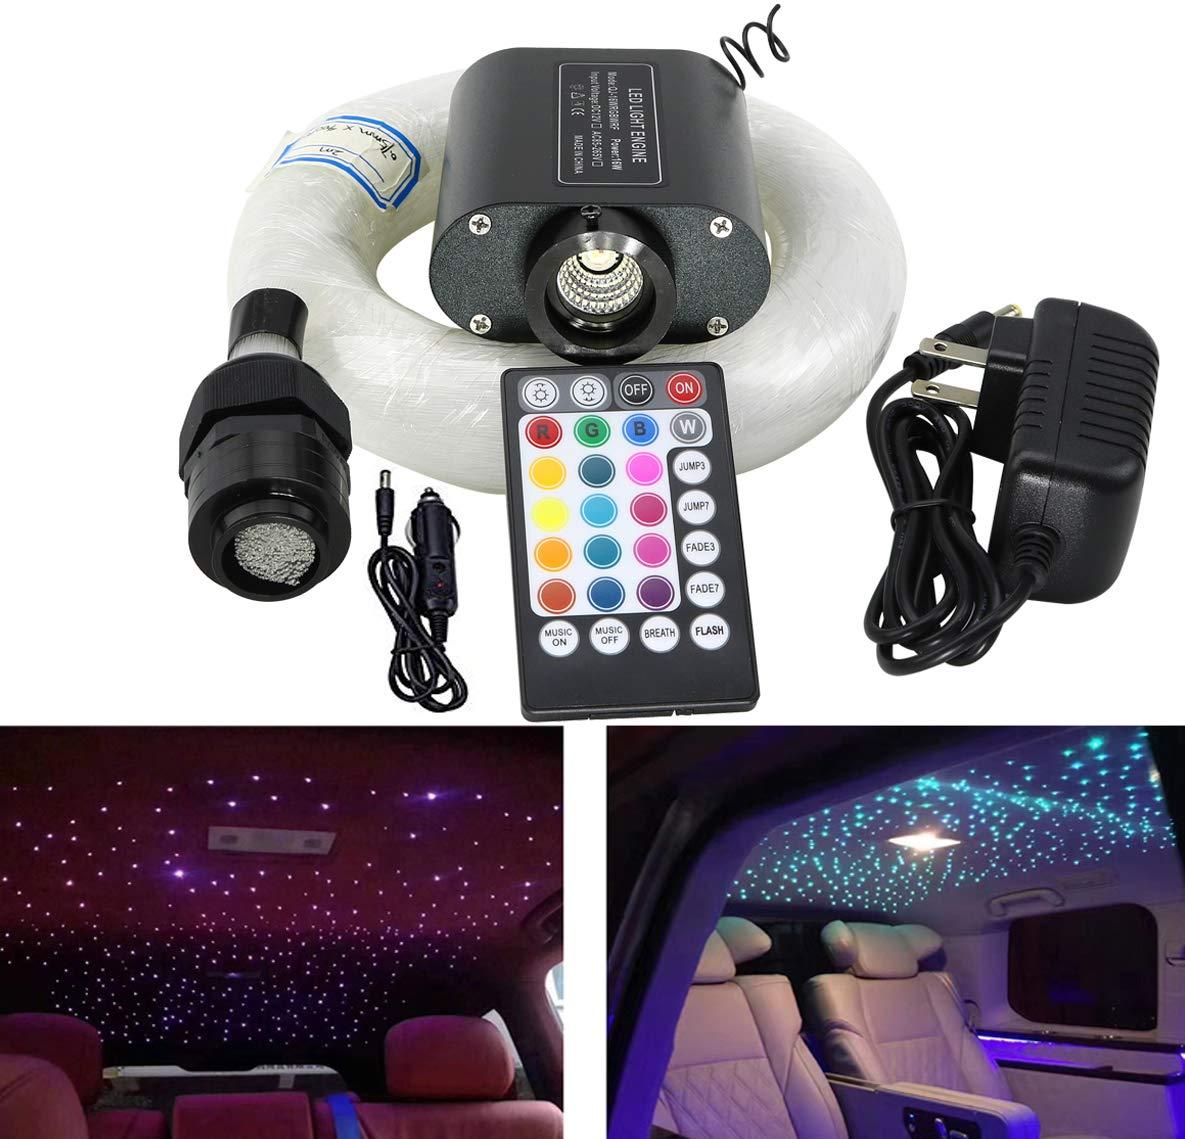 AZIMOM 16W Remote RGBW Led Fiber Optic Star Ceiling Kit for Sensory Curtain Waterfall Lighting Car Home Decoration 450pcs 0.75mm 9.8ft